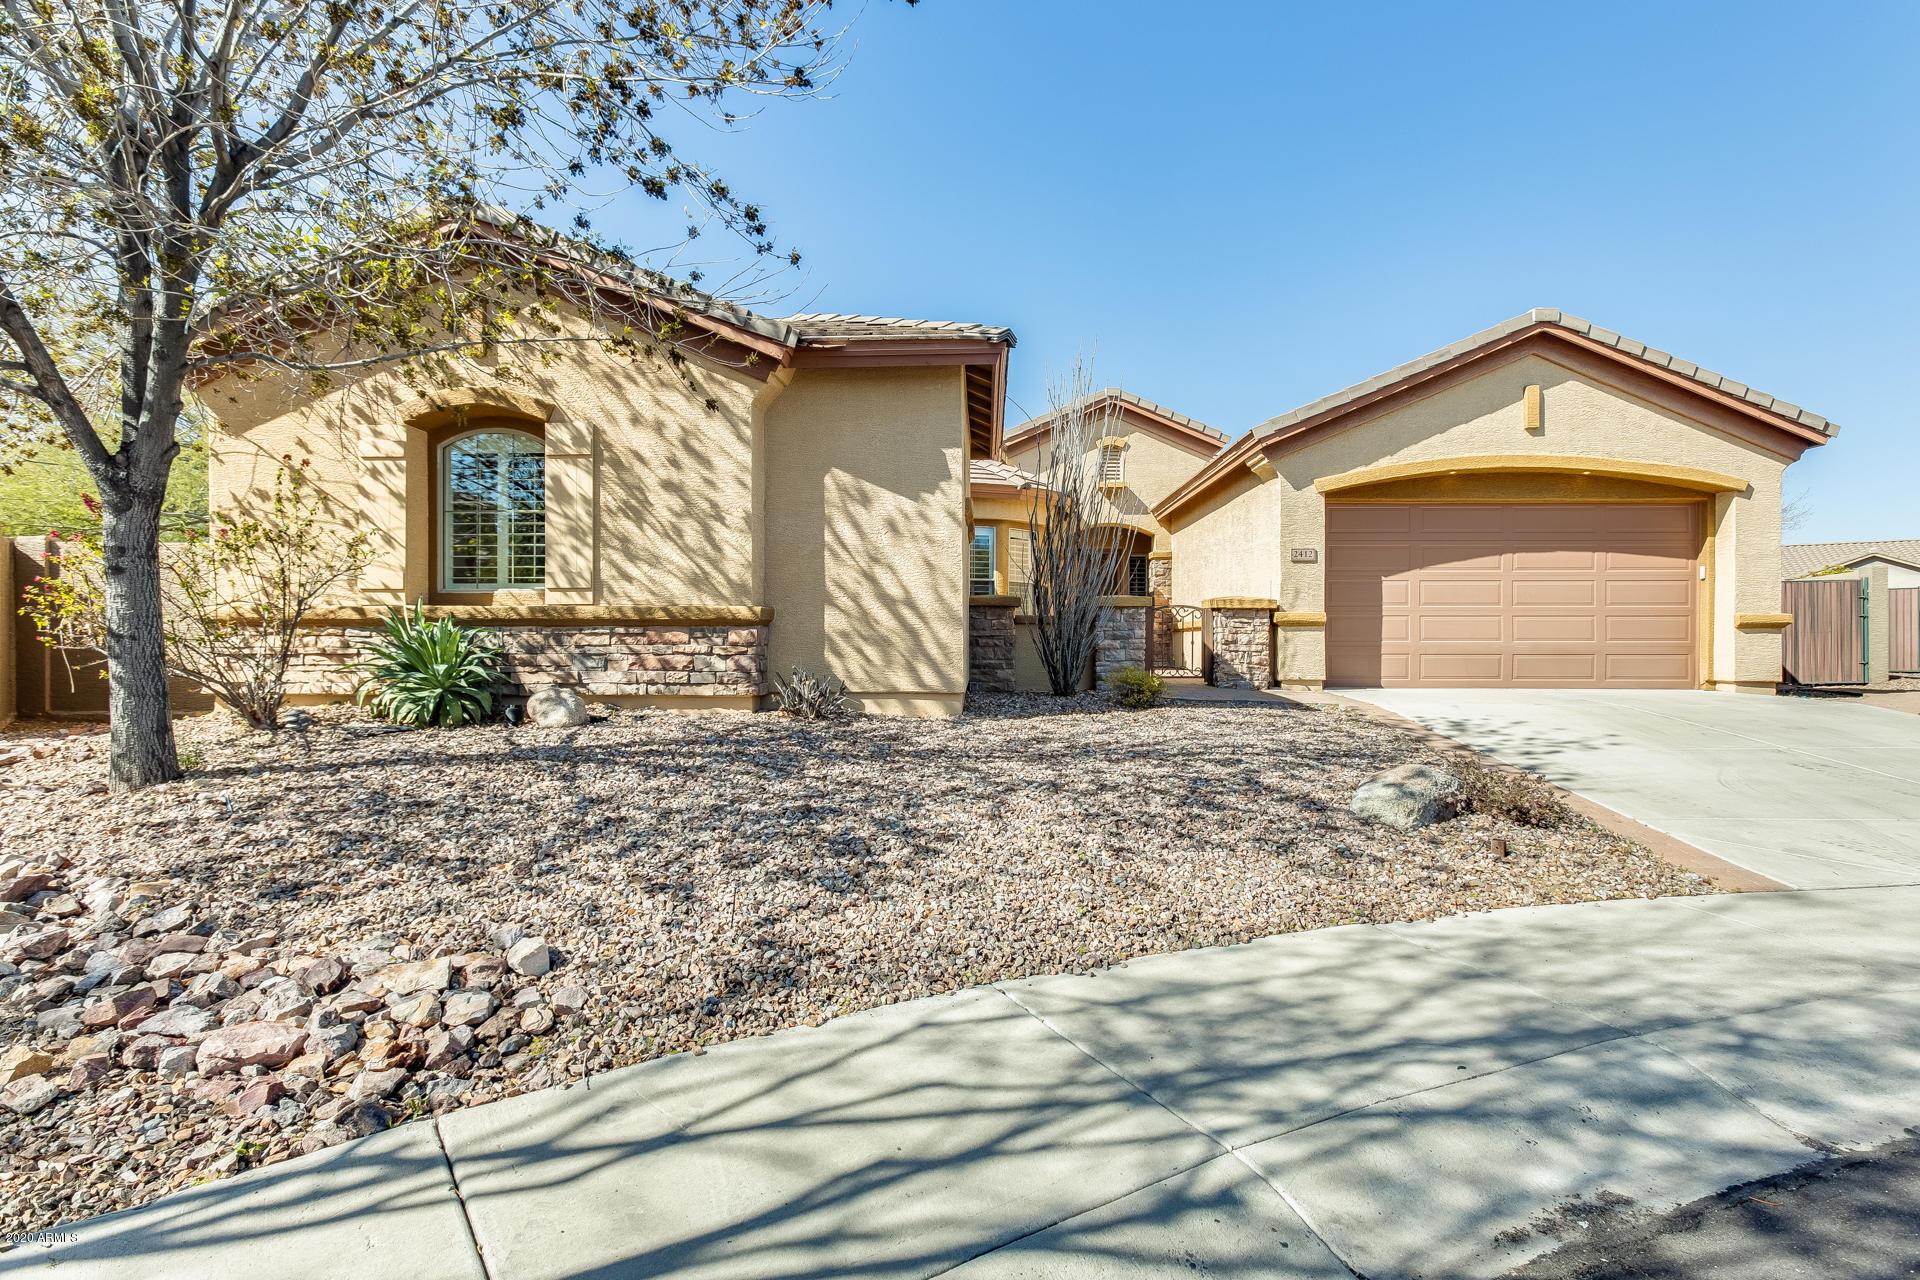 Photo of 2412 W KIT CARSON Court, Phoenix, AZ 85086